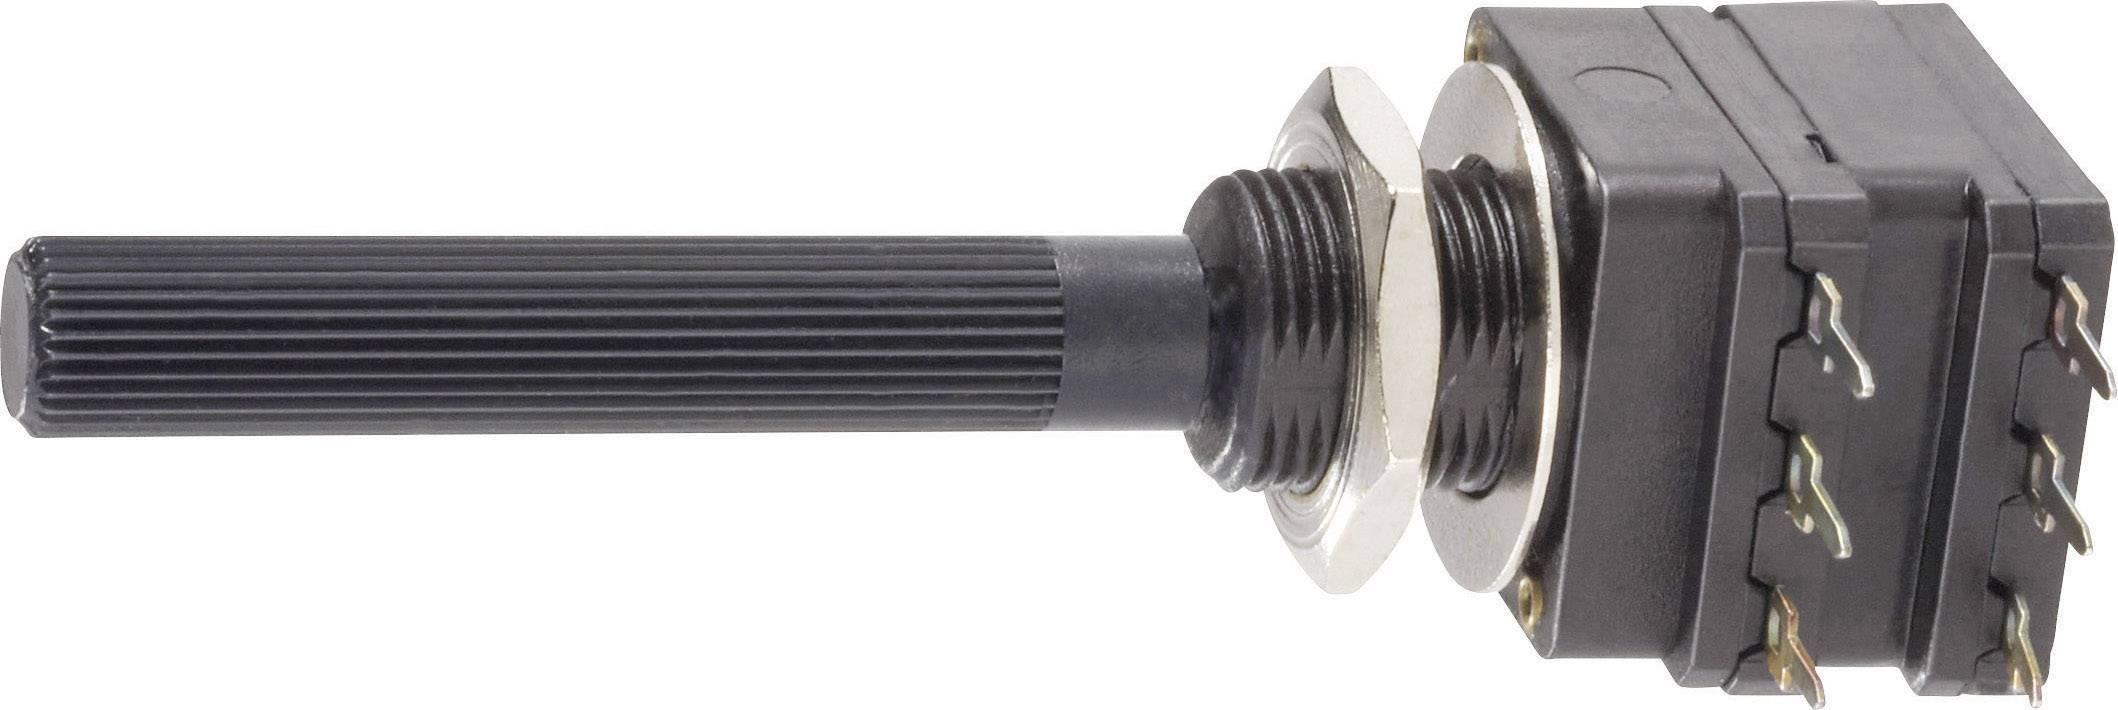 Otočný potenciometer stereo Piher PC16DH-10IP06204B2020MTA PC16DH-10IP06204B2020MTA, 0.1 W, 220 kOhm, 1 ks